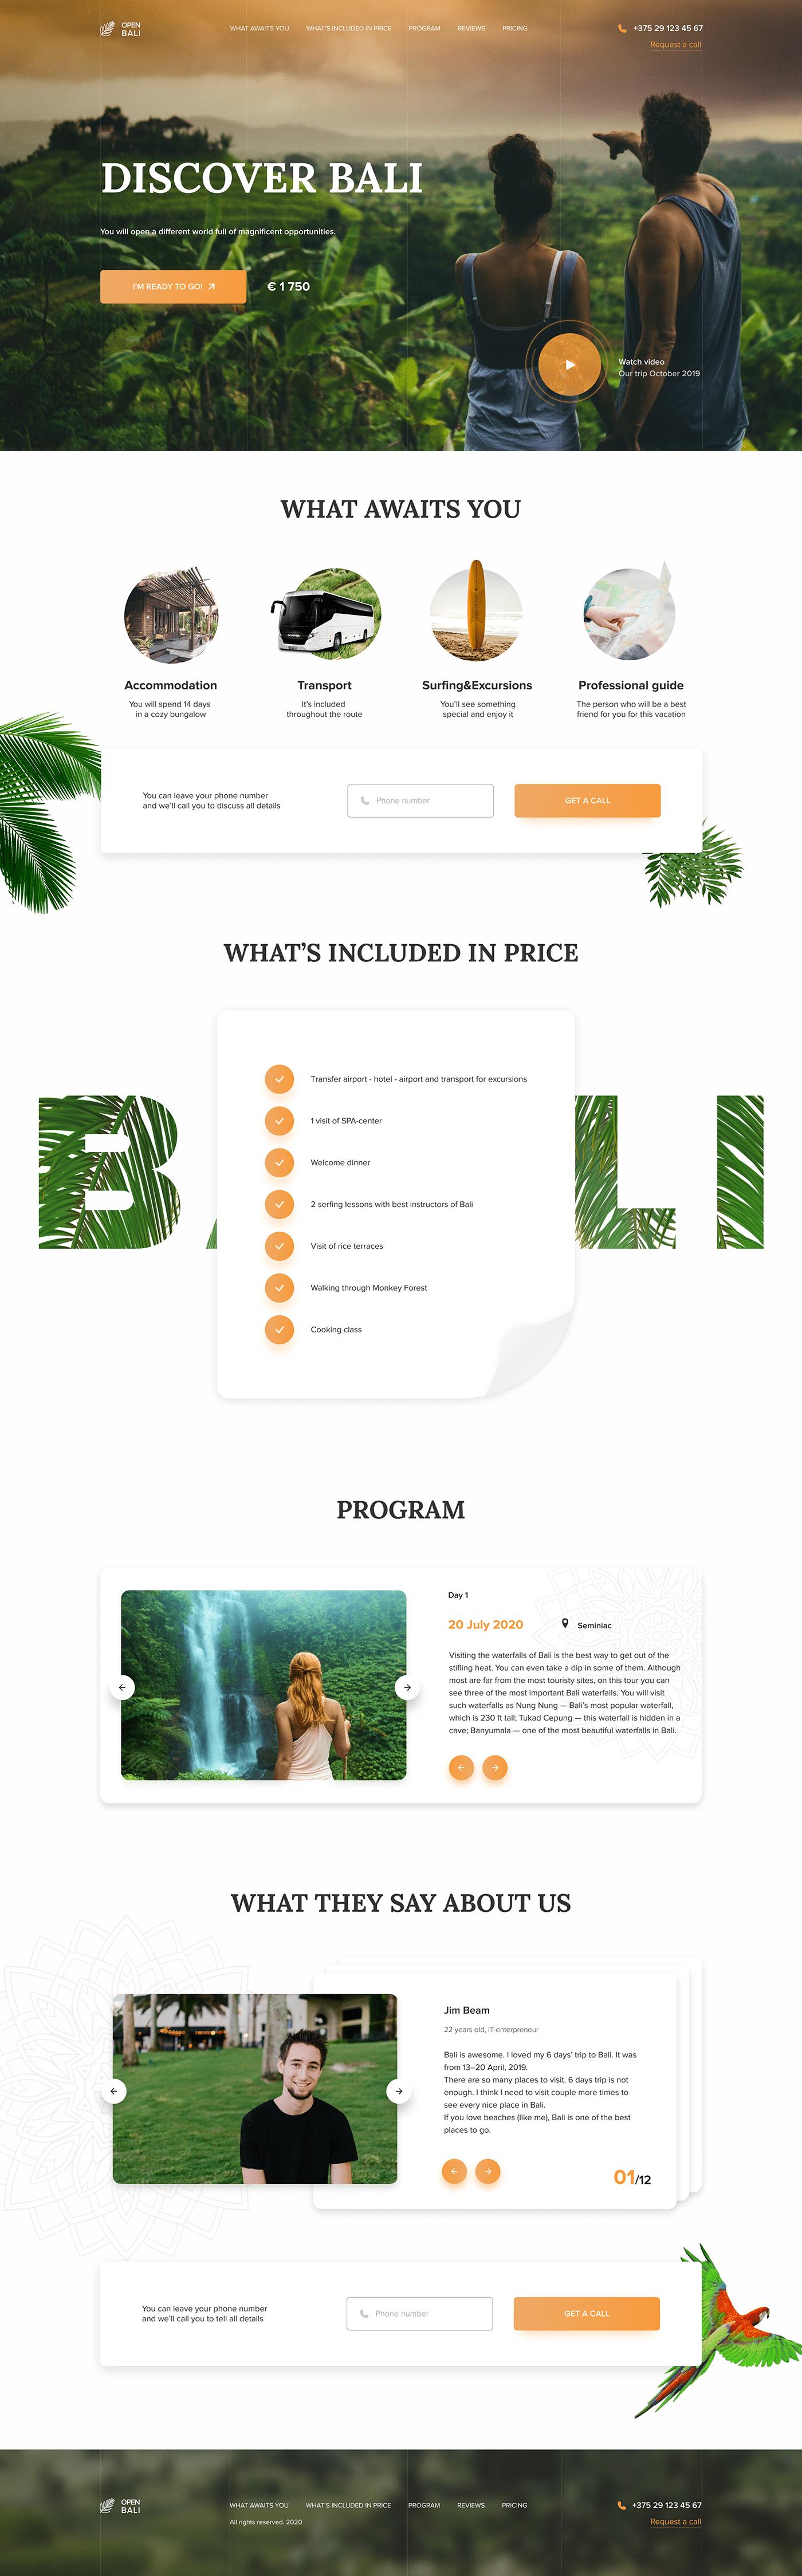 bali concept discover landing landing page travel agency Figma Web Design